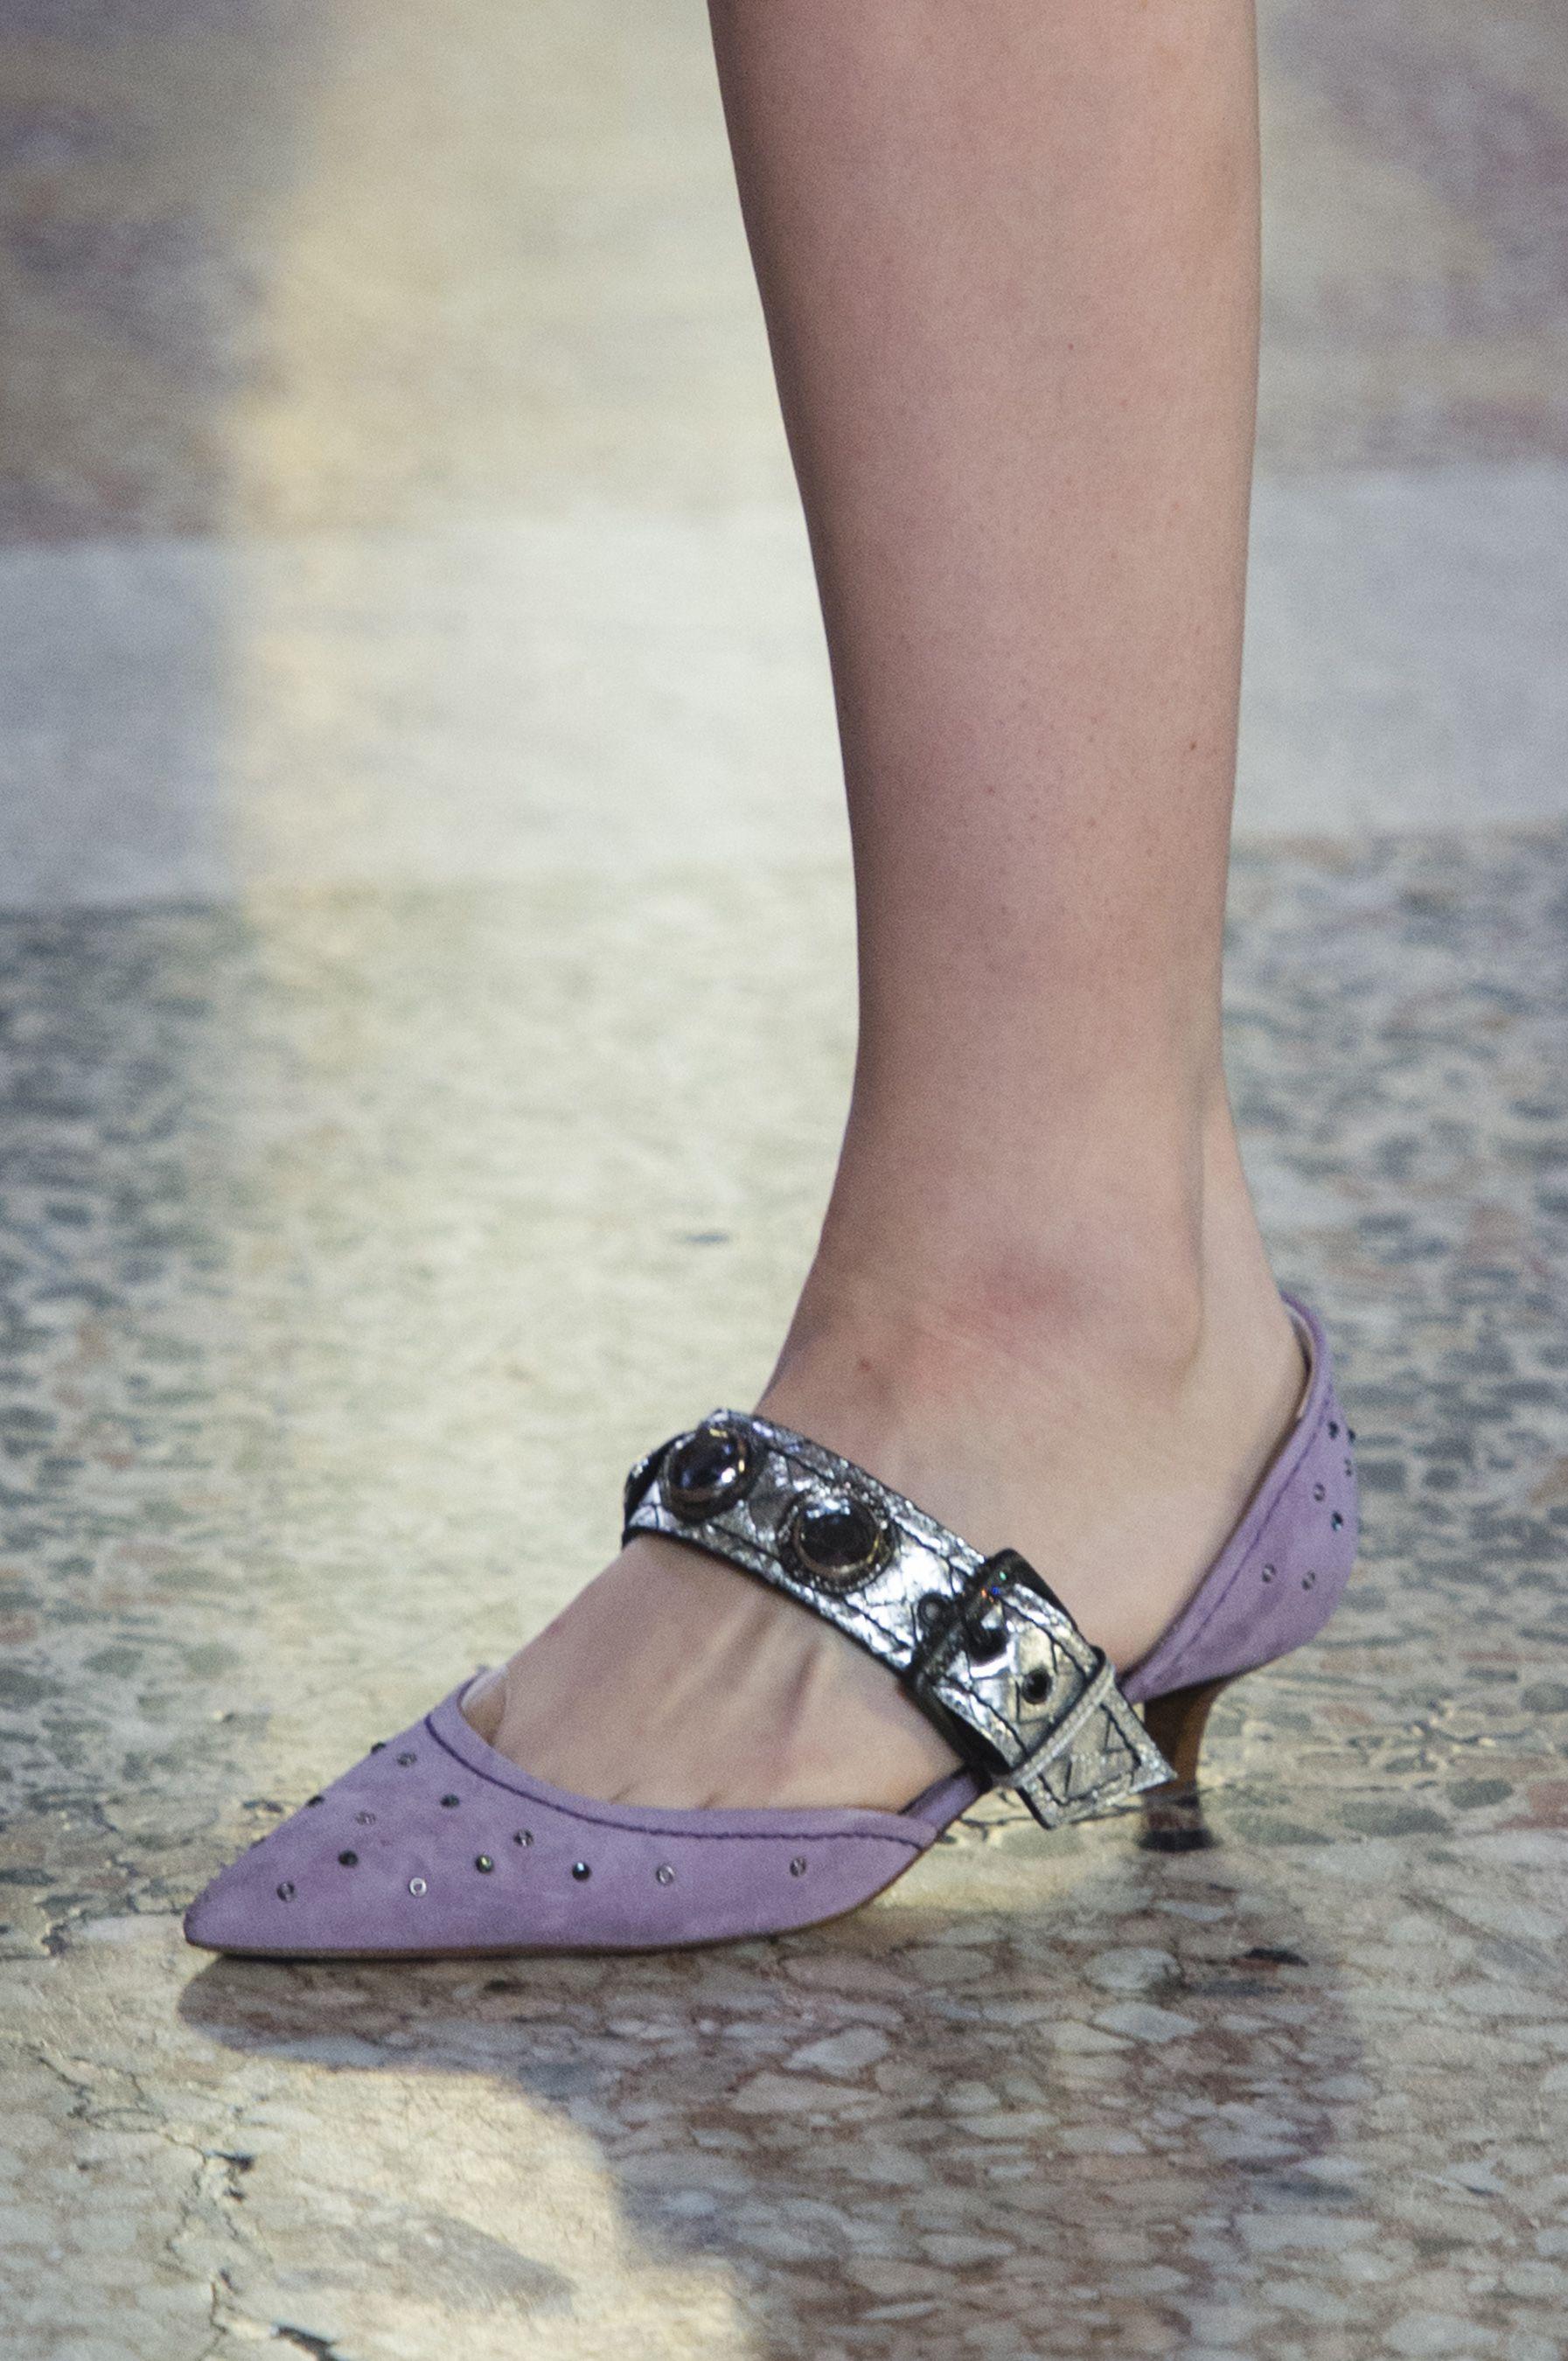 Pin On Shoephilia